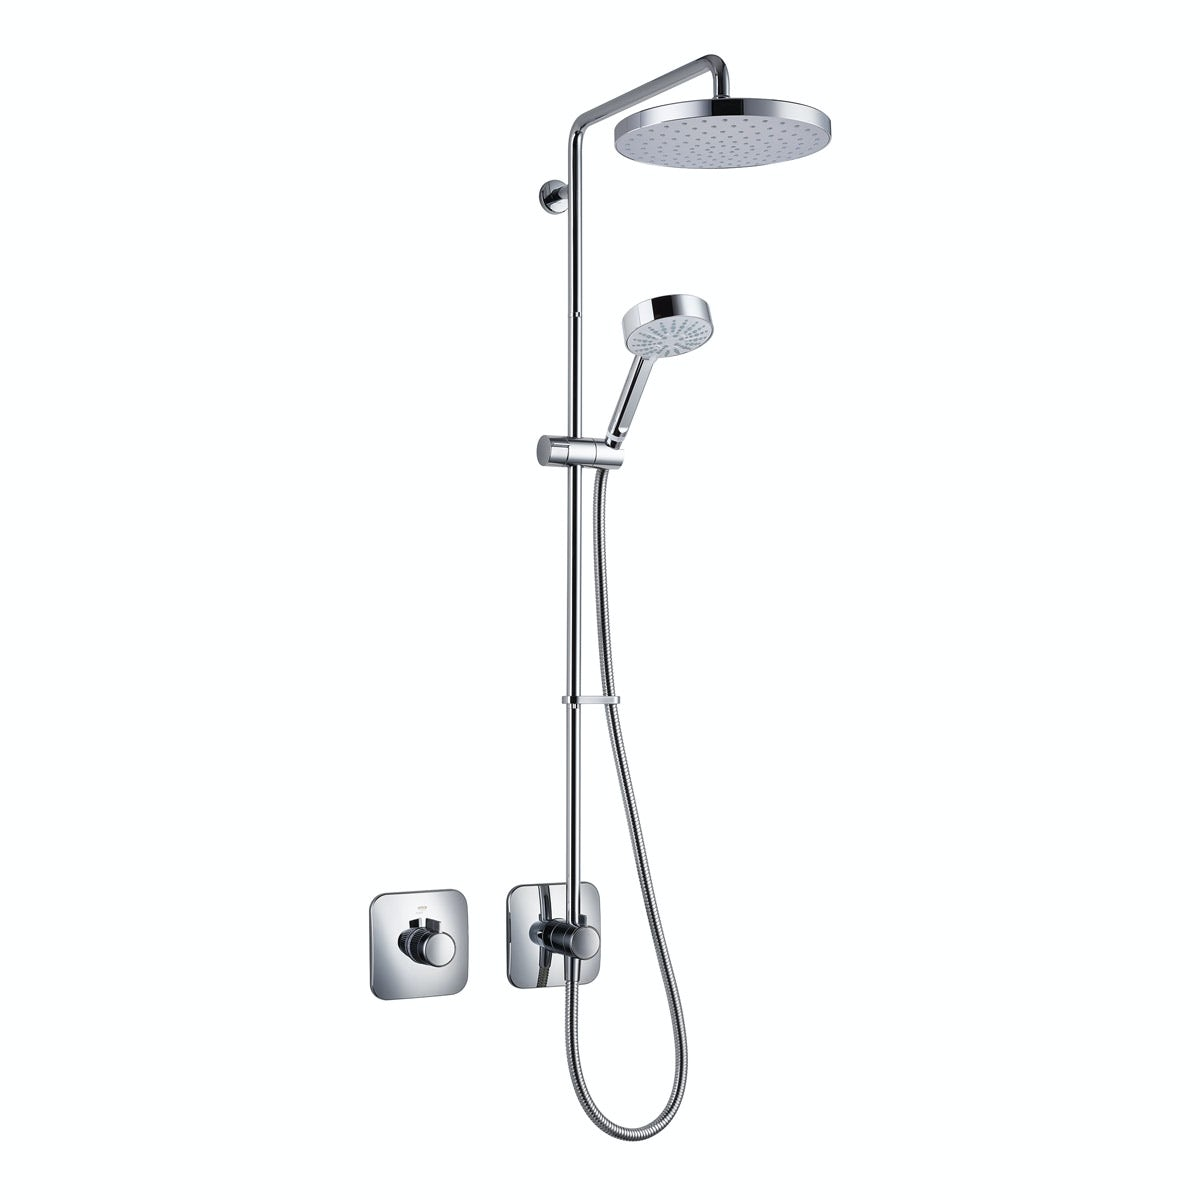 Mira Adept BRD+ thermostatic mixer shower